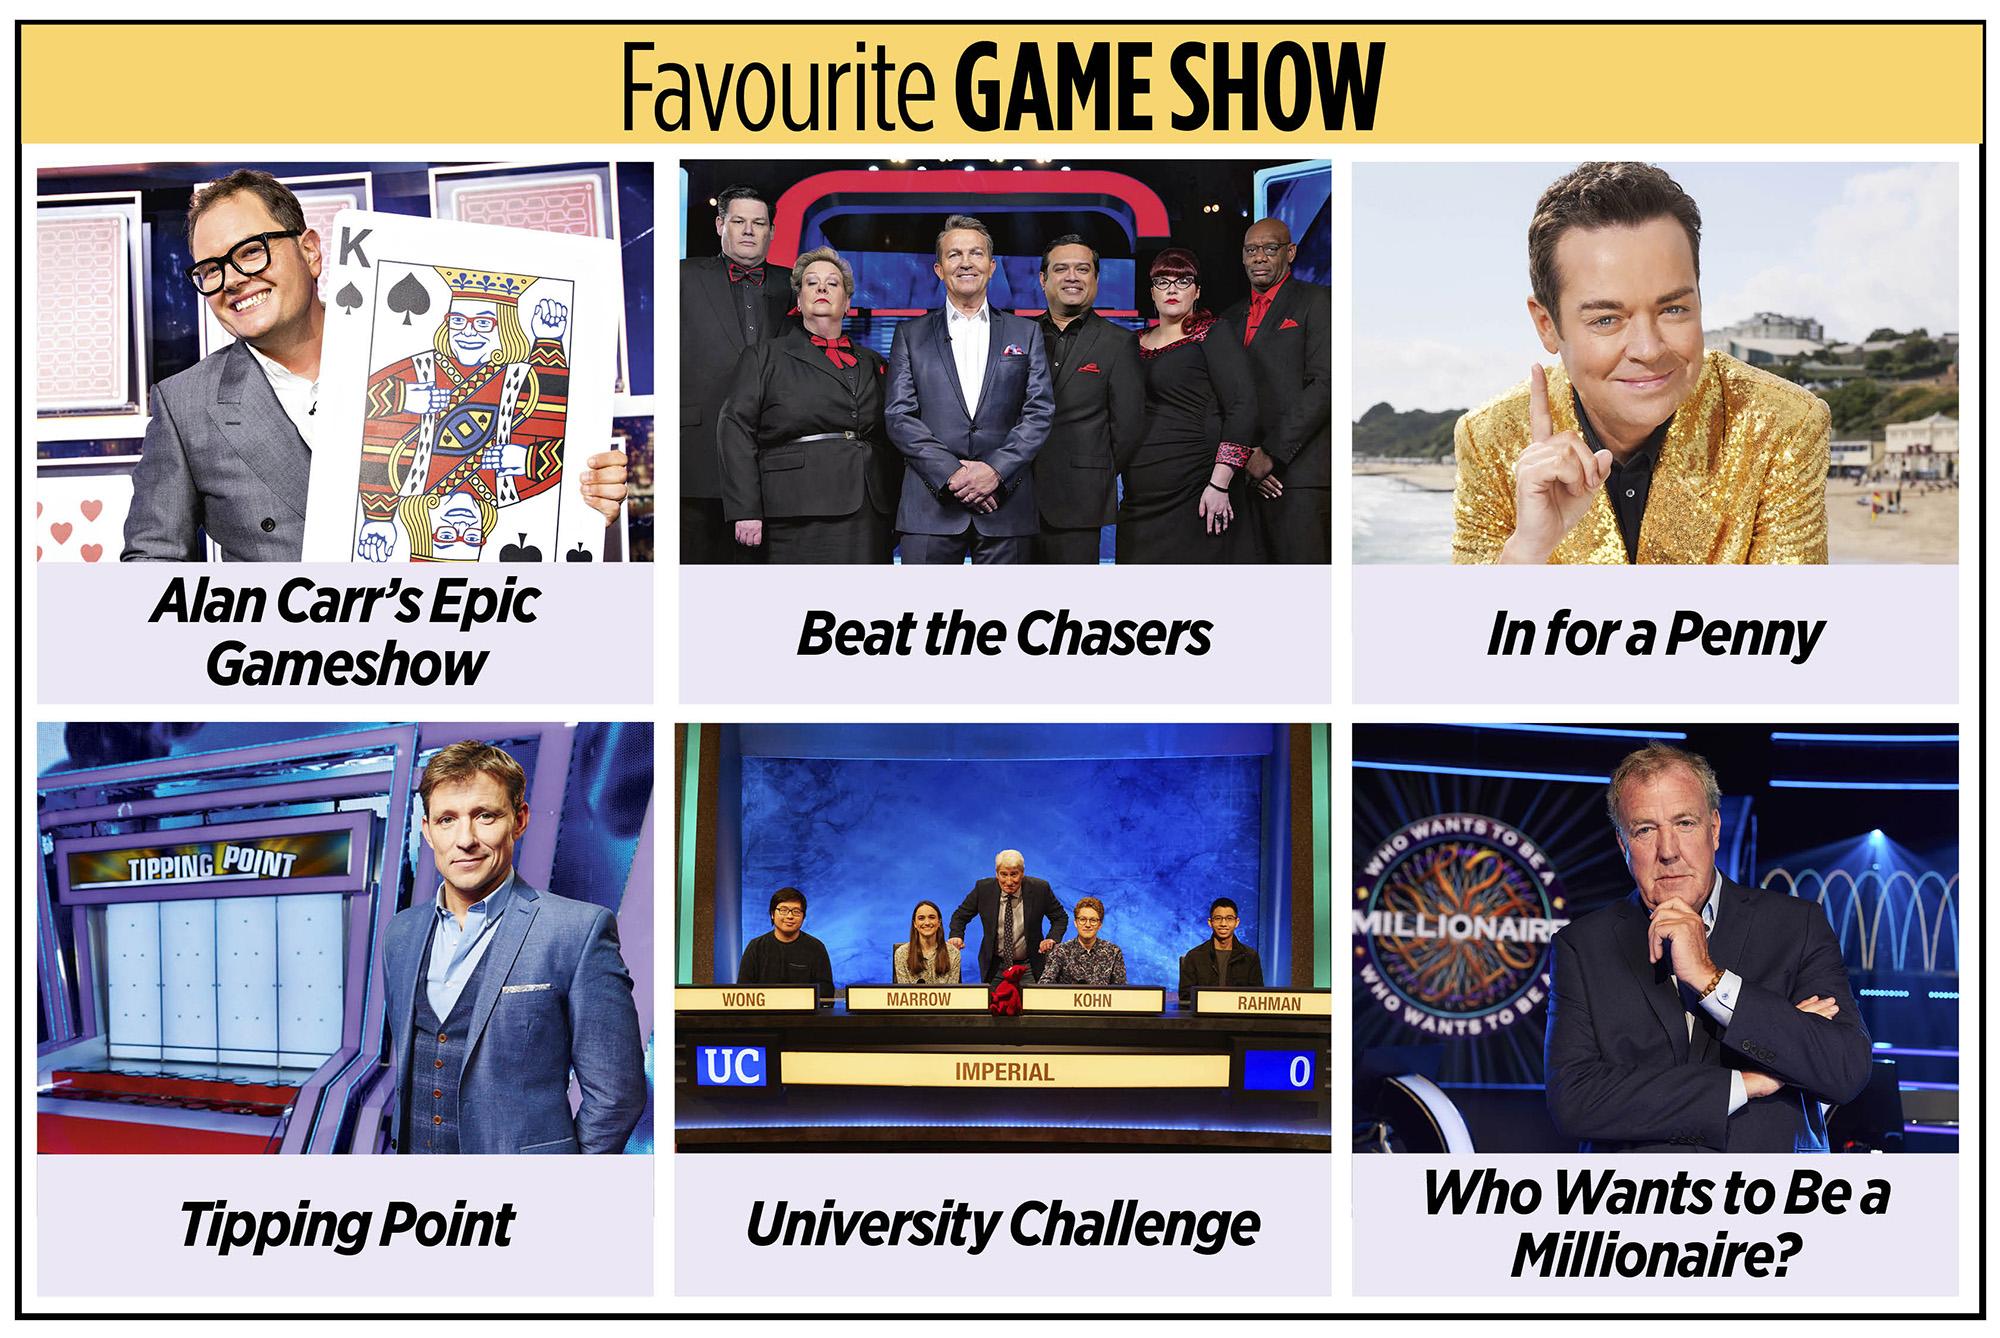 Programa de juegos favorito de TV Times Awards 2020